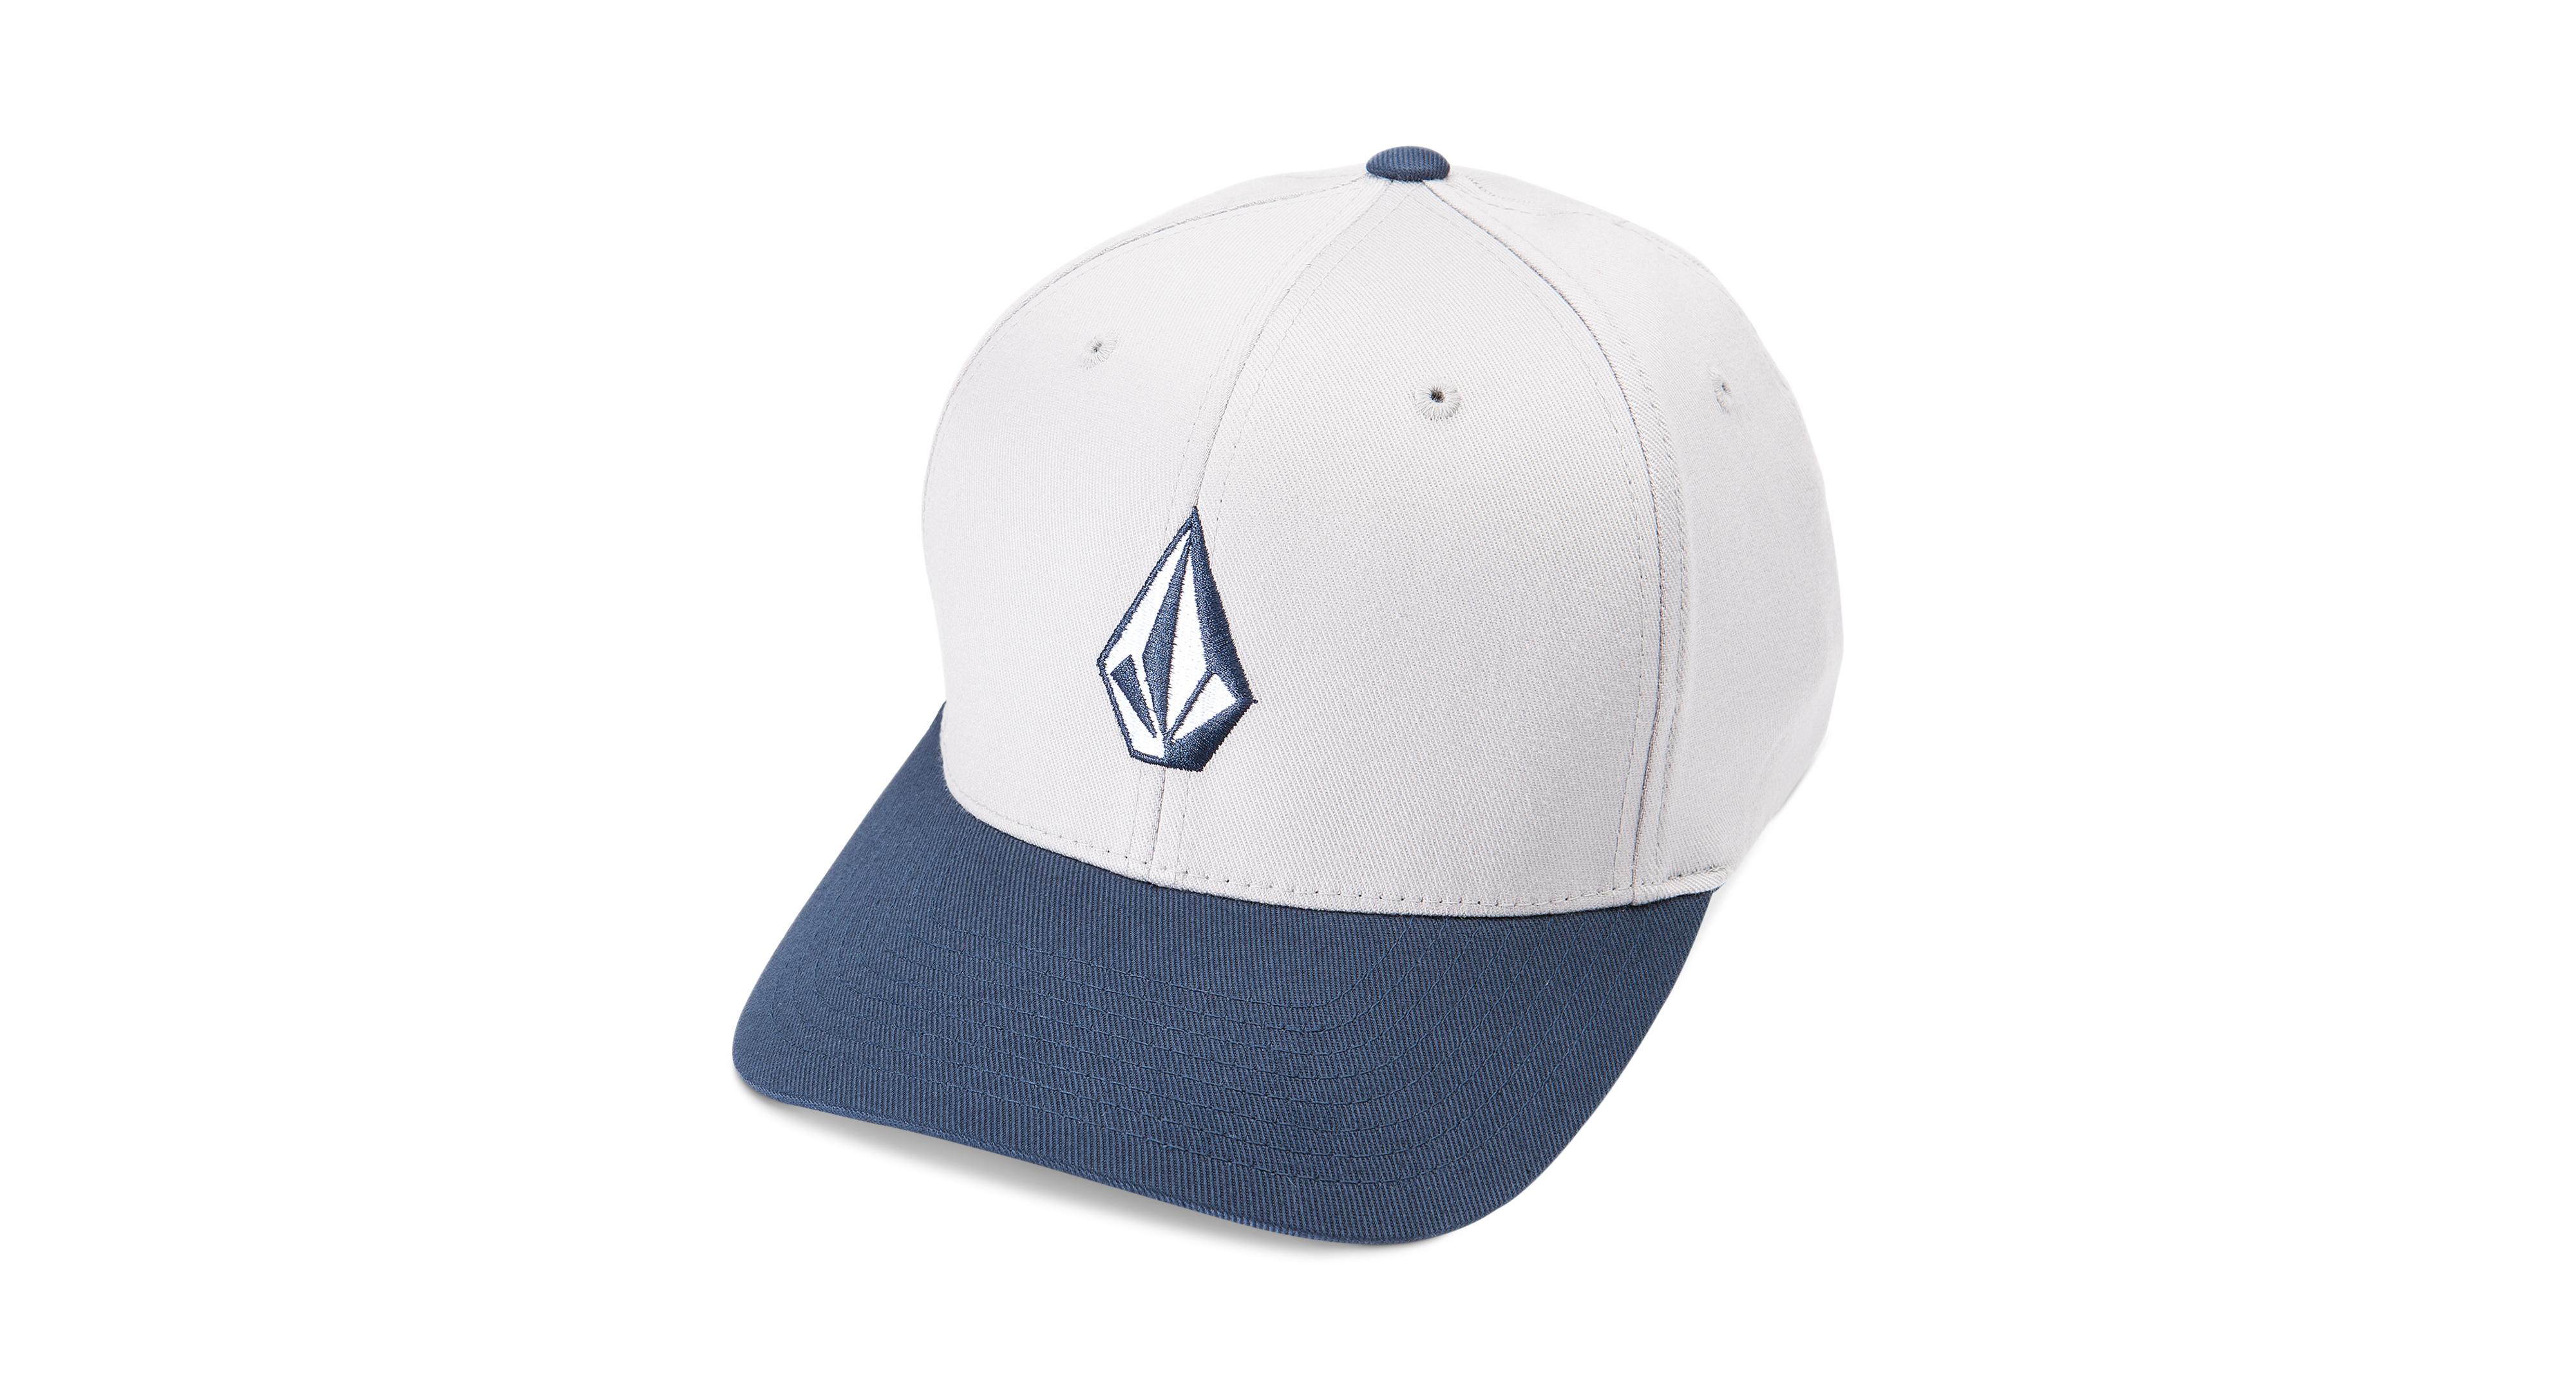 727e0786 Men's Full Stone Flex Fit Hat | Hats | Flex fit hats, Hats, Baseball ...